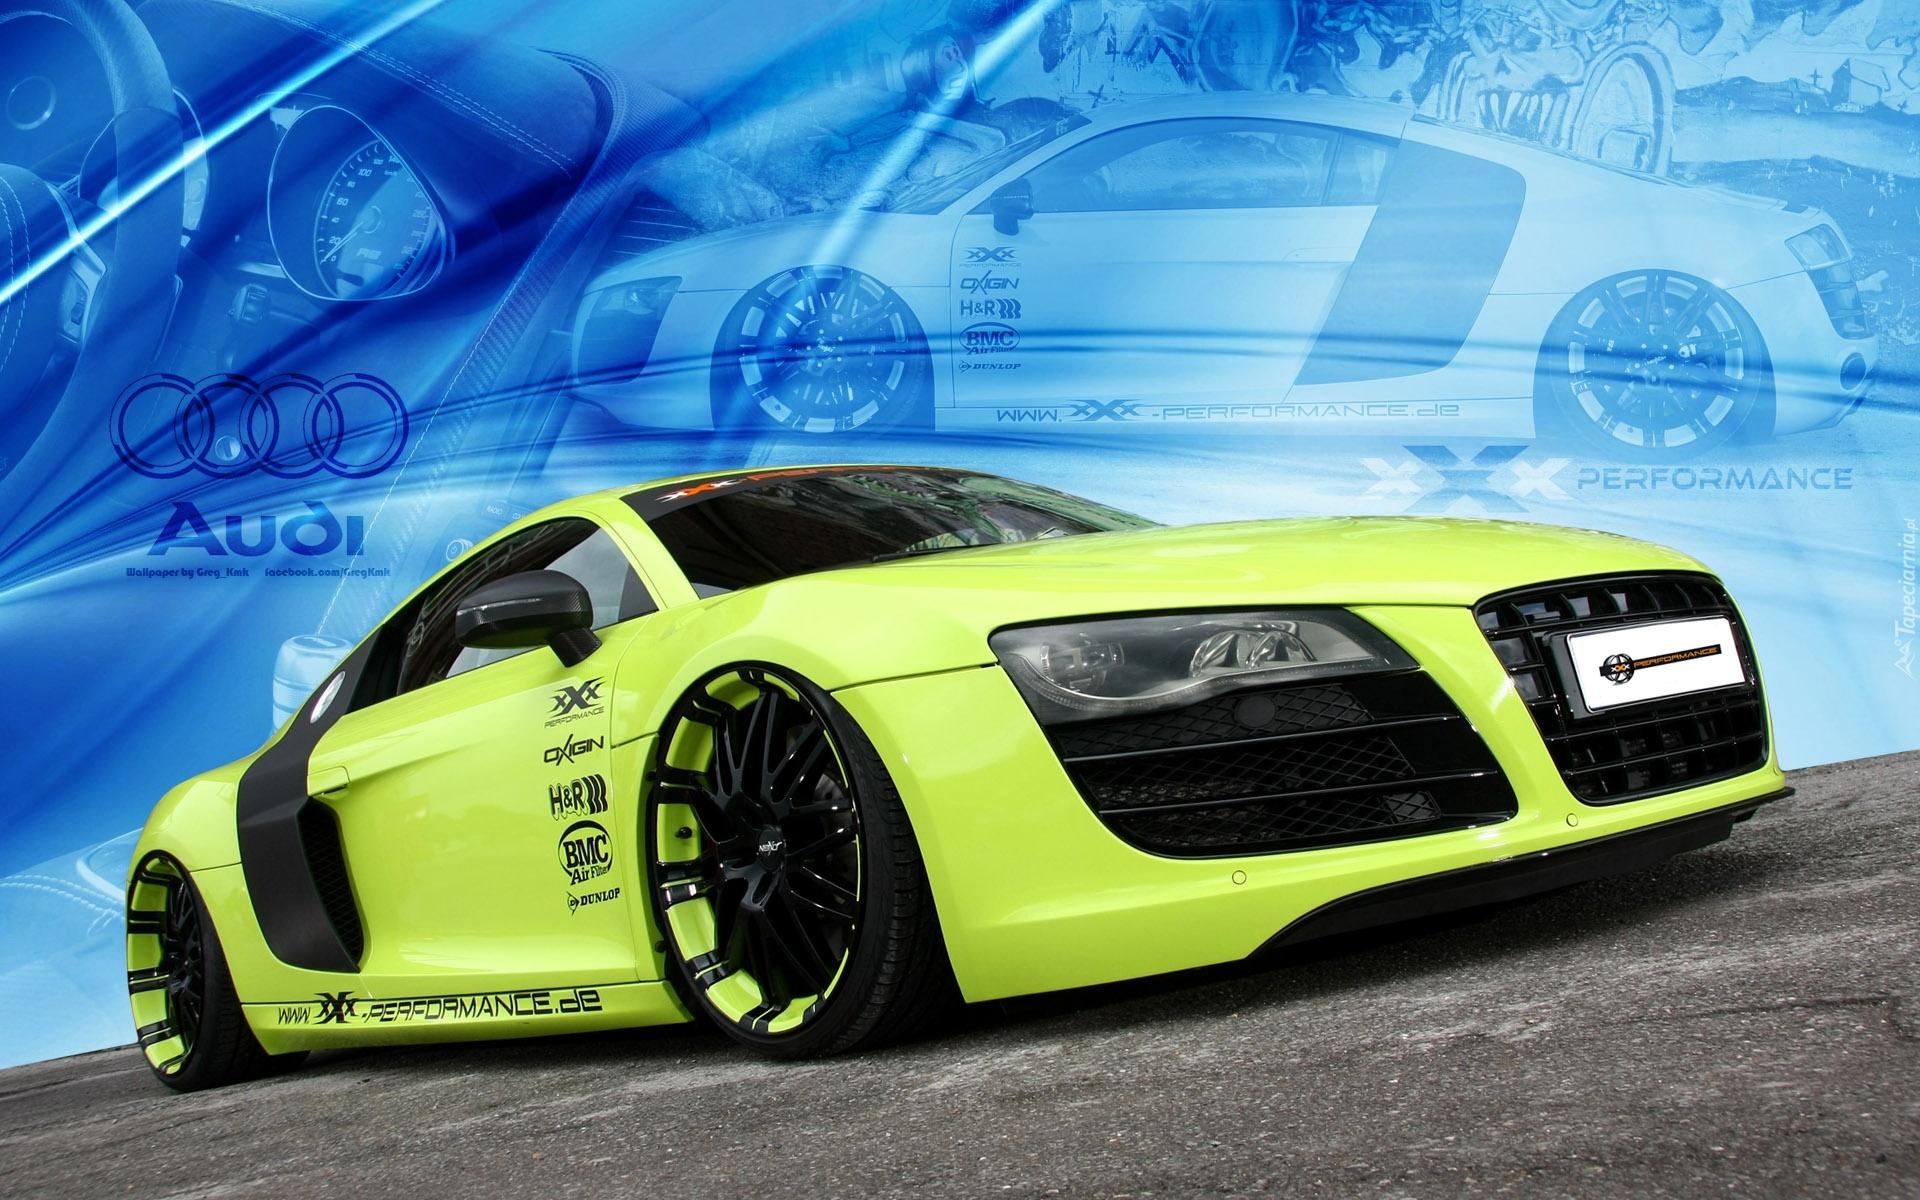 Audi R8 Xxx Performance Tuning